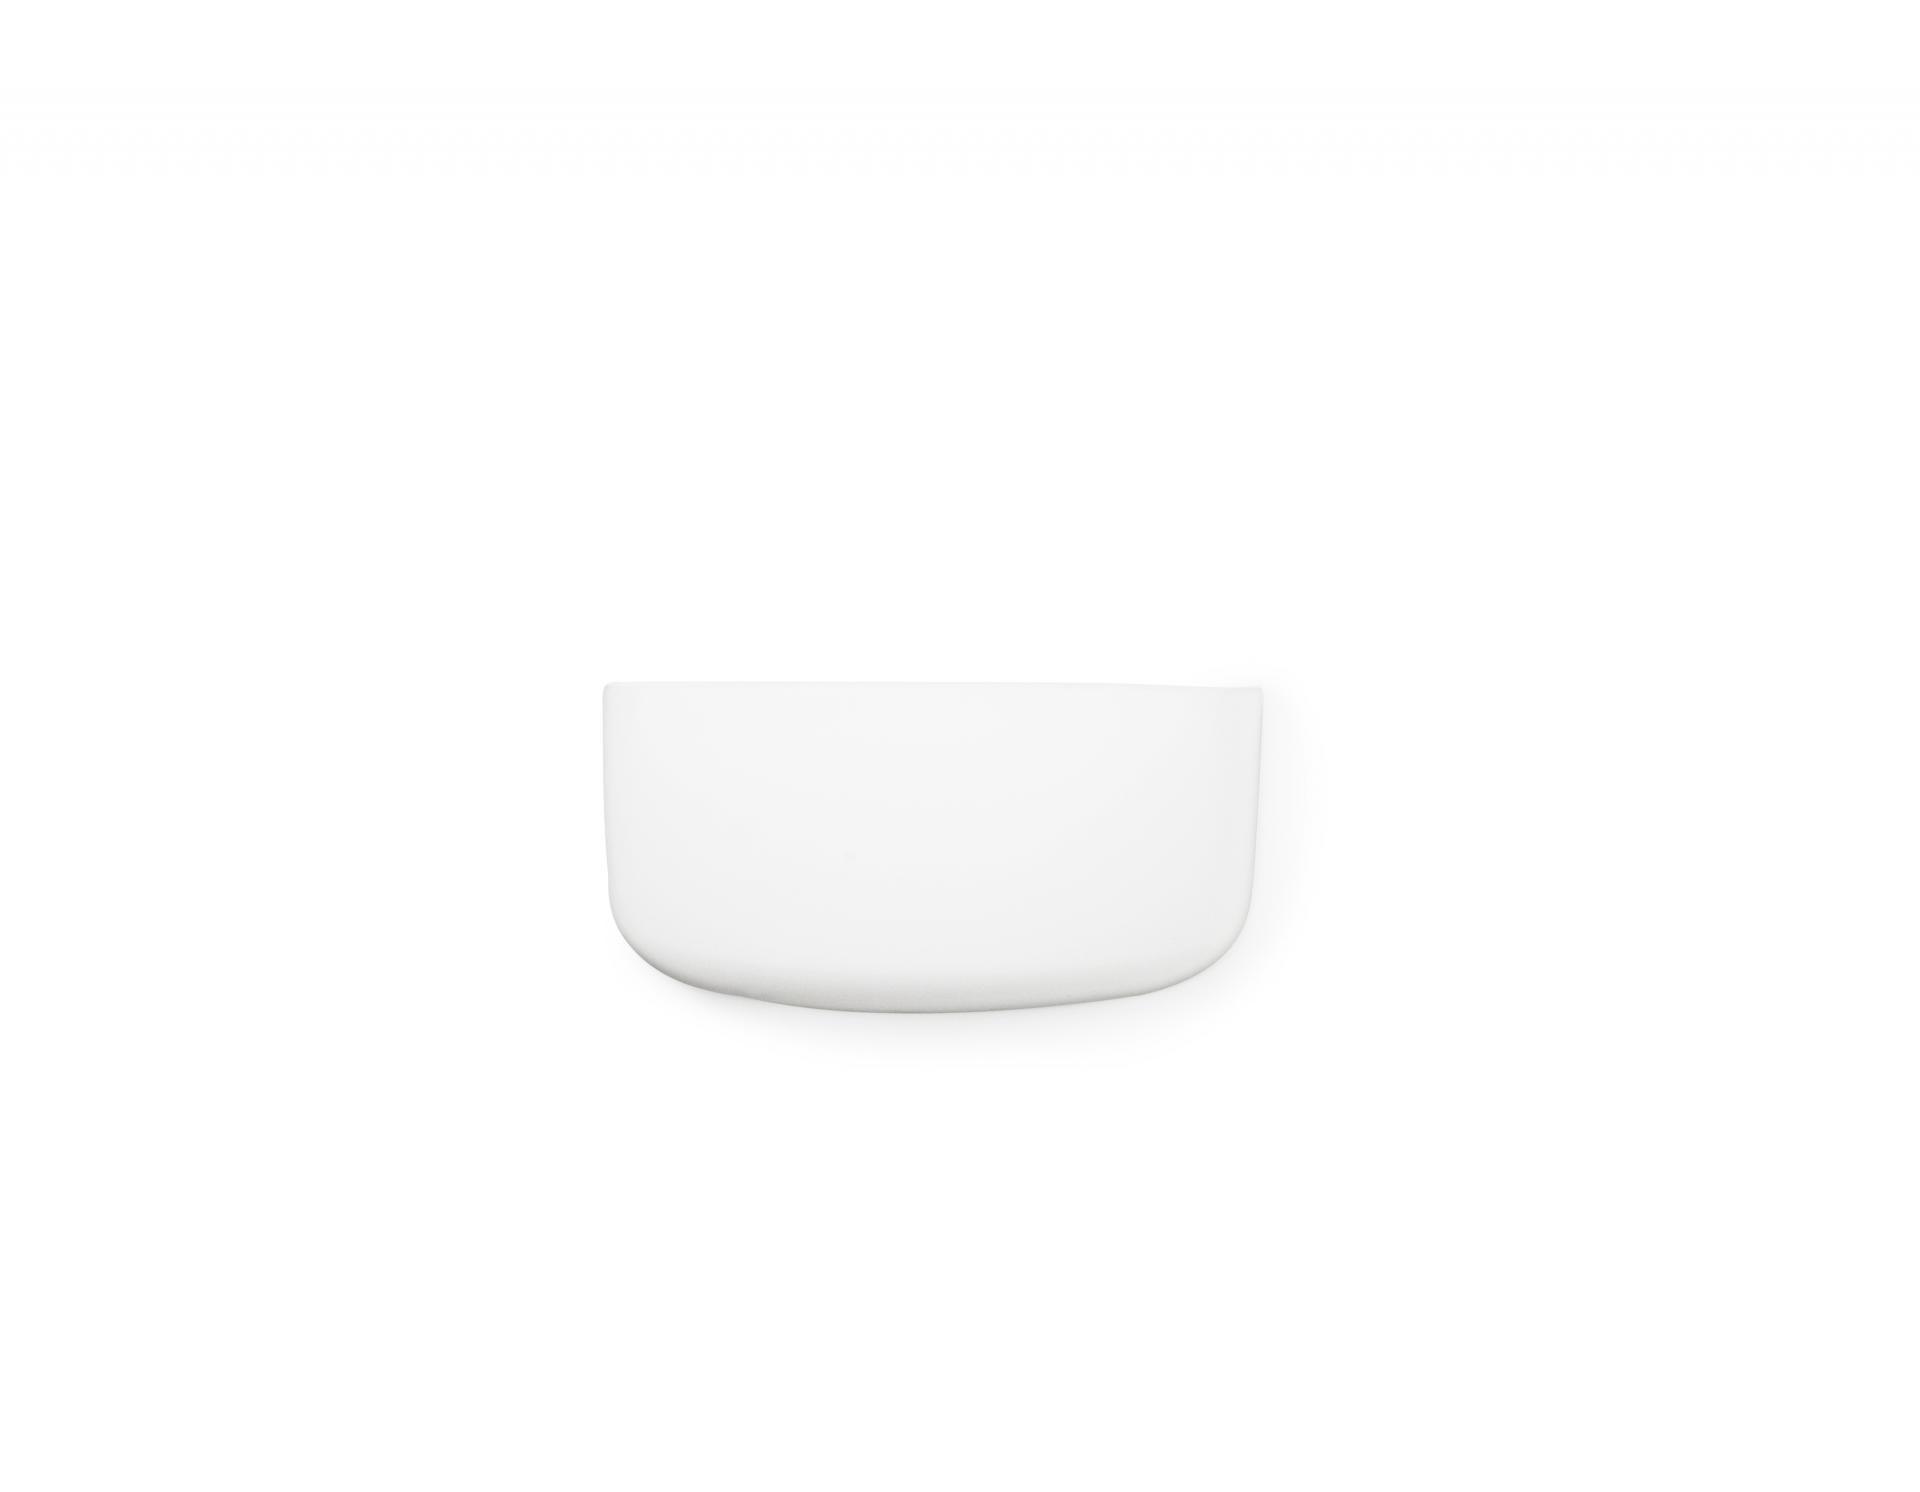 Normann Copenhagen Nástěnný organizér White Pocket 1, bílá barva, plast